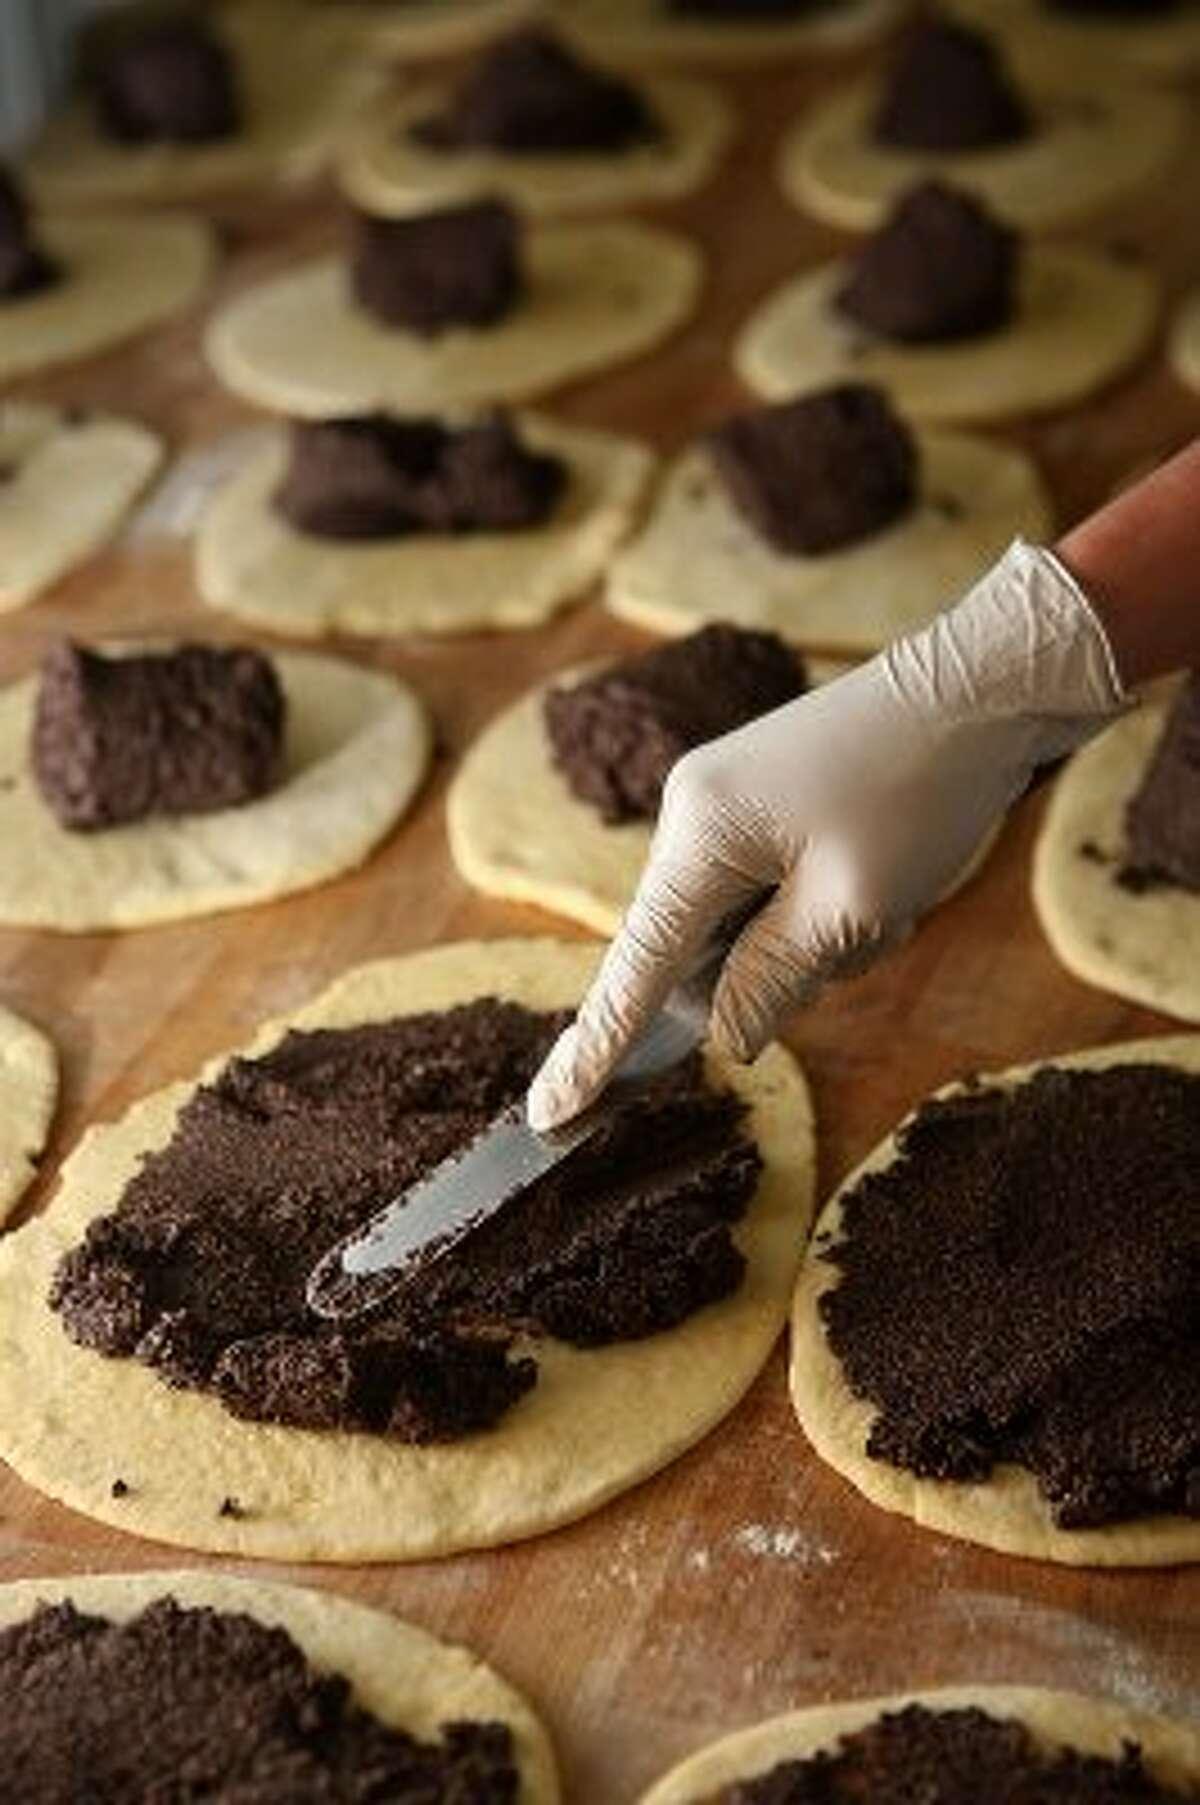 Poppyseed rolls being made (Liz Hafalia / The Chronicle)